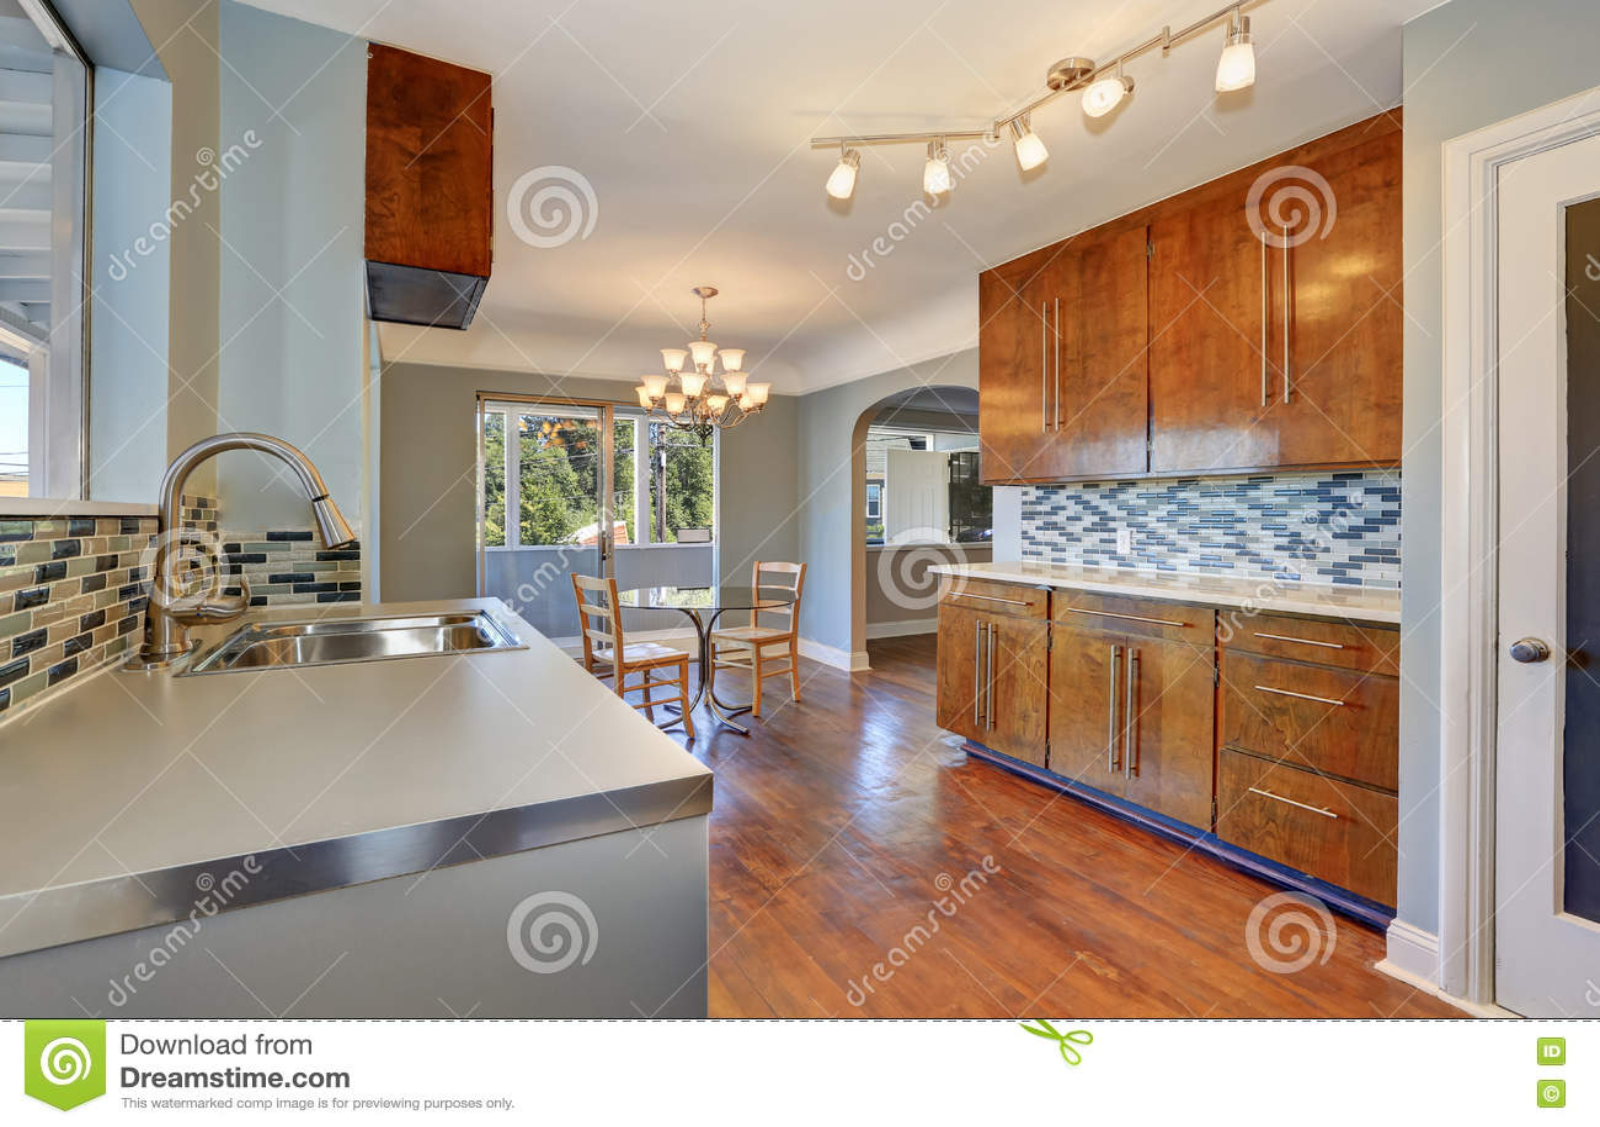 kitchen updates table sets 有餐厅内部和硬木地板的厨房库存照片 图片包括有更新 拱道 内部 空白 有餐厅内部和硬木地板的厨房